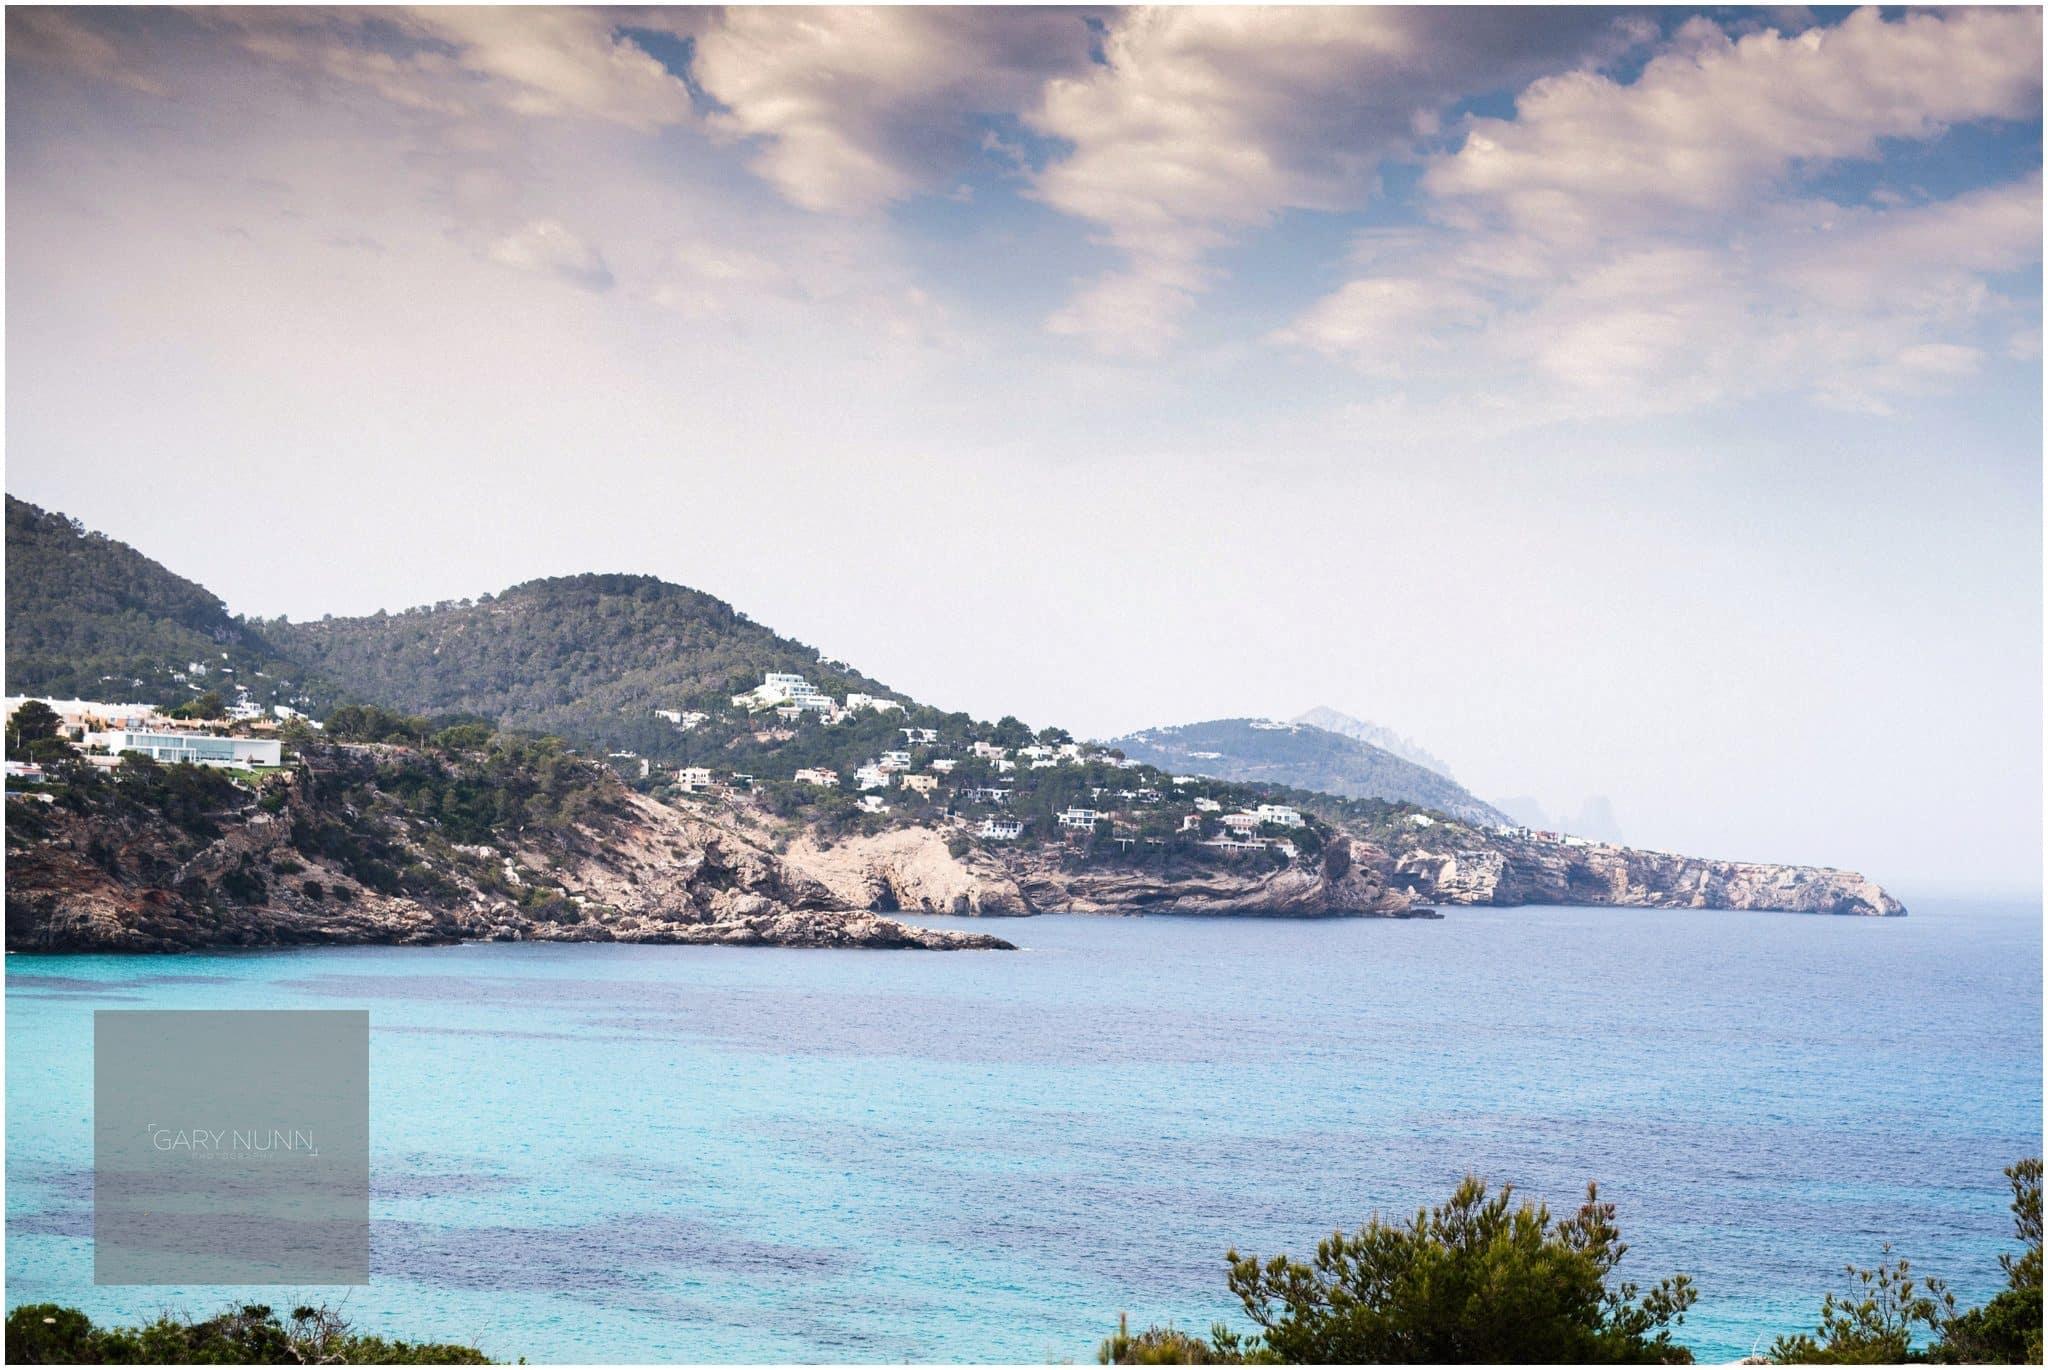 elixir weddings ibiza, best wedding venues, Elixir Shore Club, Ibiza Wedding Photography, Milton Keynes Wedding Photographer, Wedding Photographer Leighton Buzzard, Destination Wedding Photographer